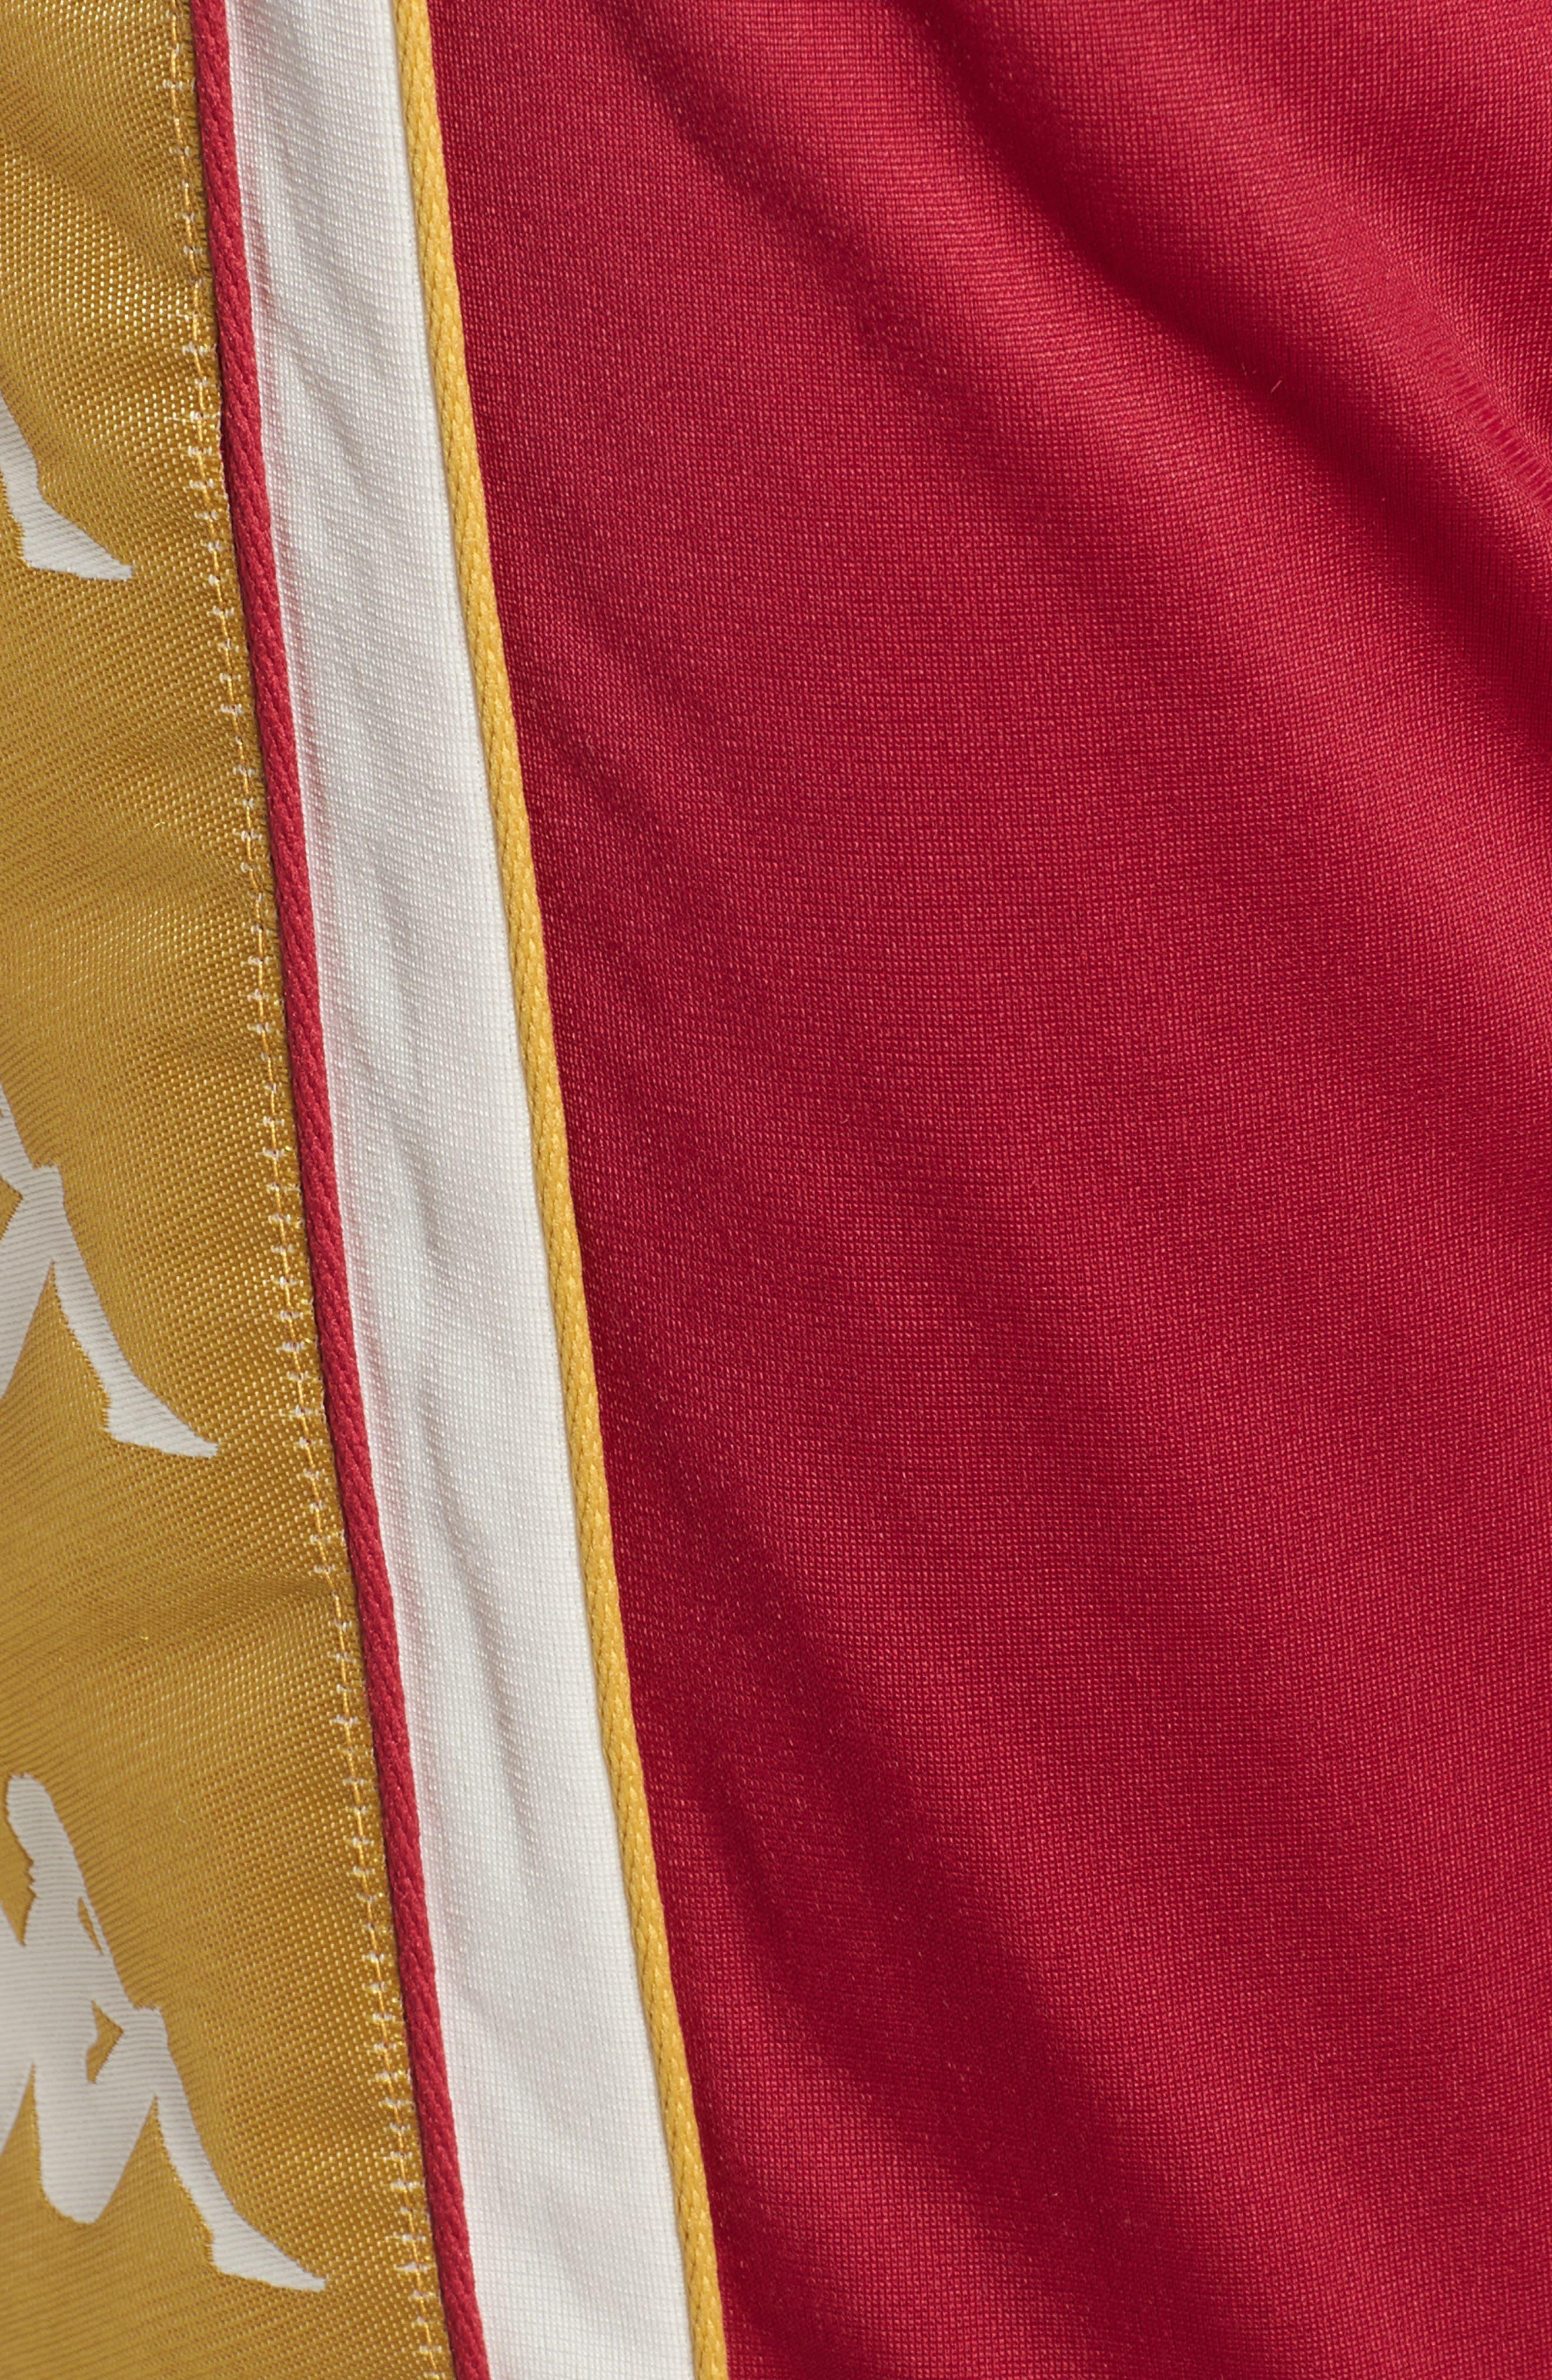 Track Pants,                             Alternate thumbnail 5, color,                             REDCERISE-WHITE-GOLD